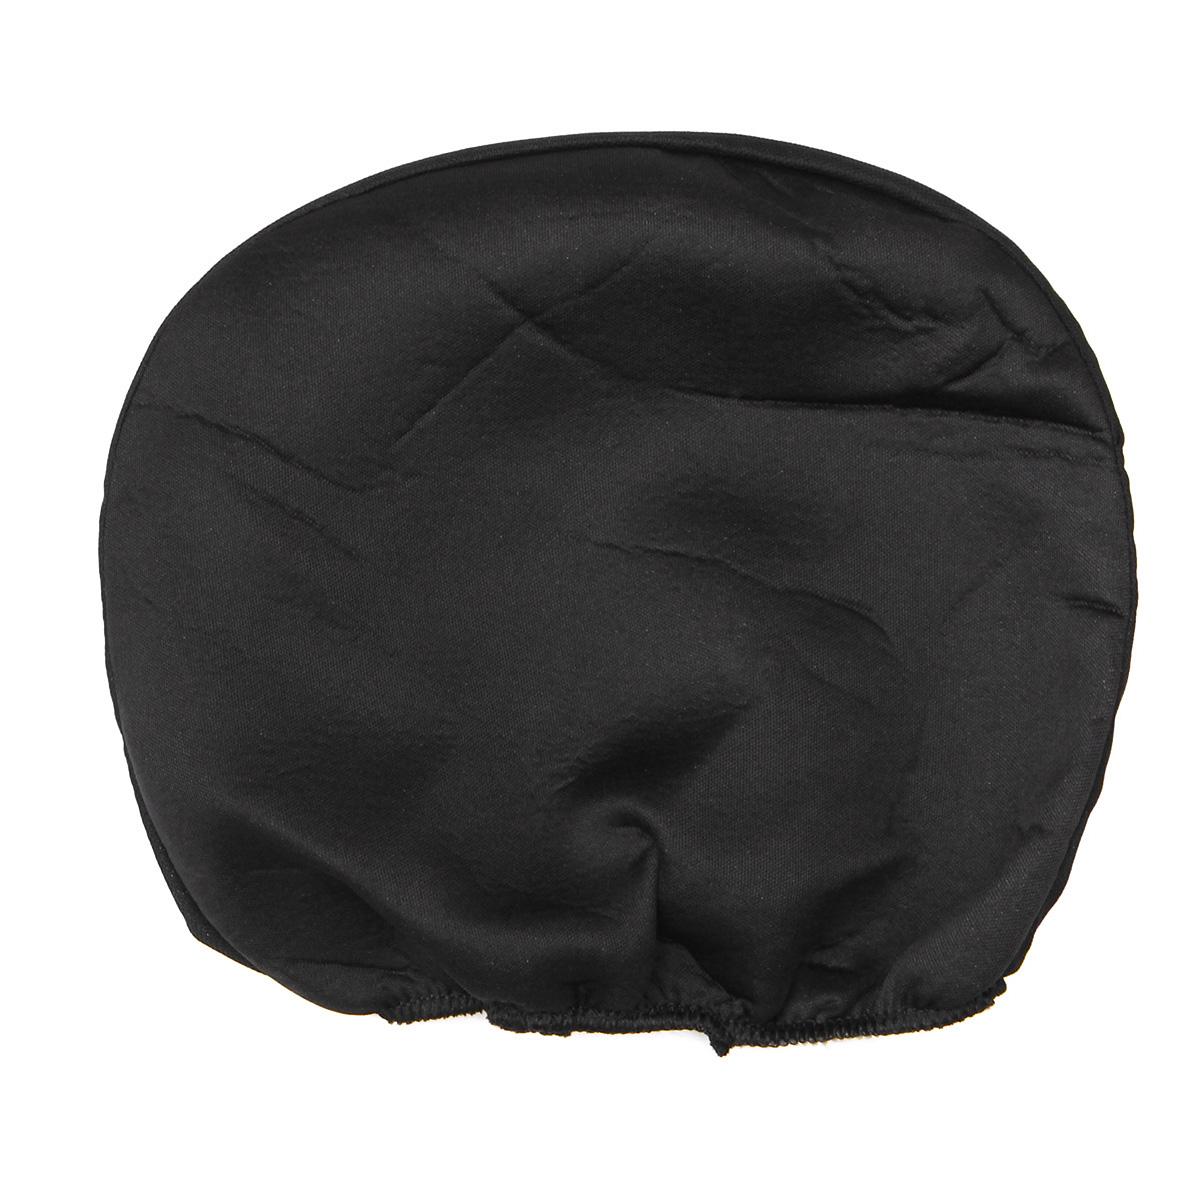 universal car seat covers front rear protectors 9 piece set washable grey black. Black Bedroom Furniture Sets. Home Design Ideas